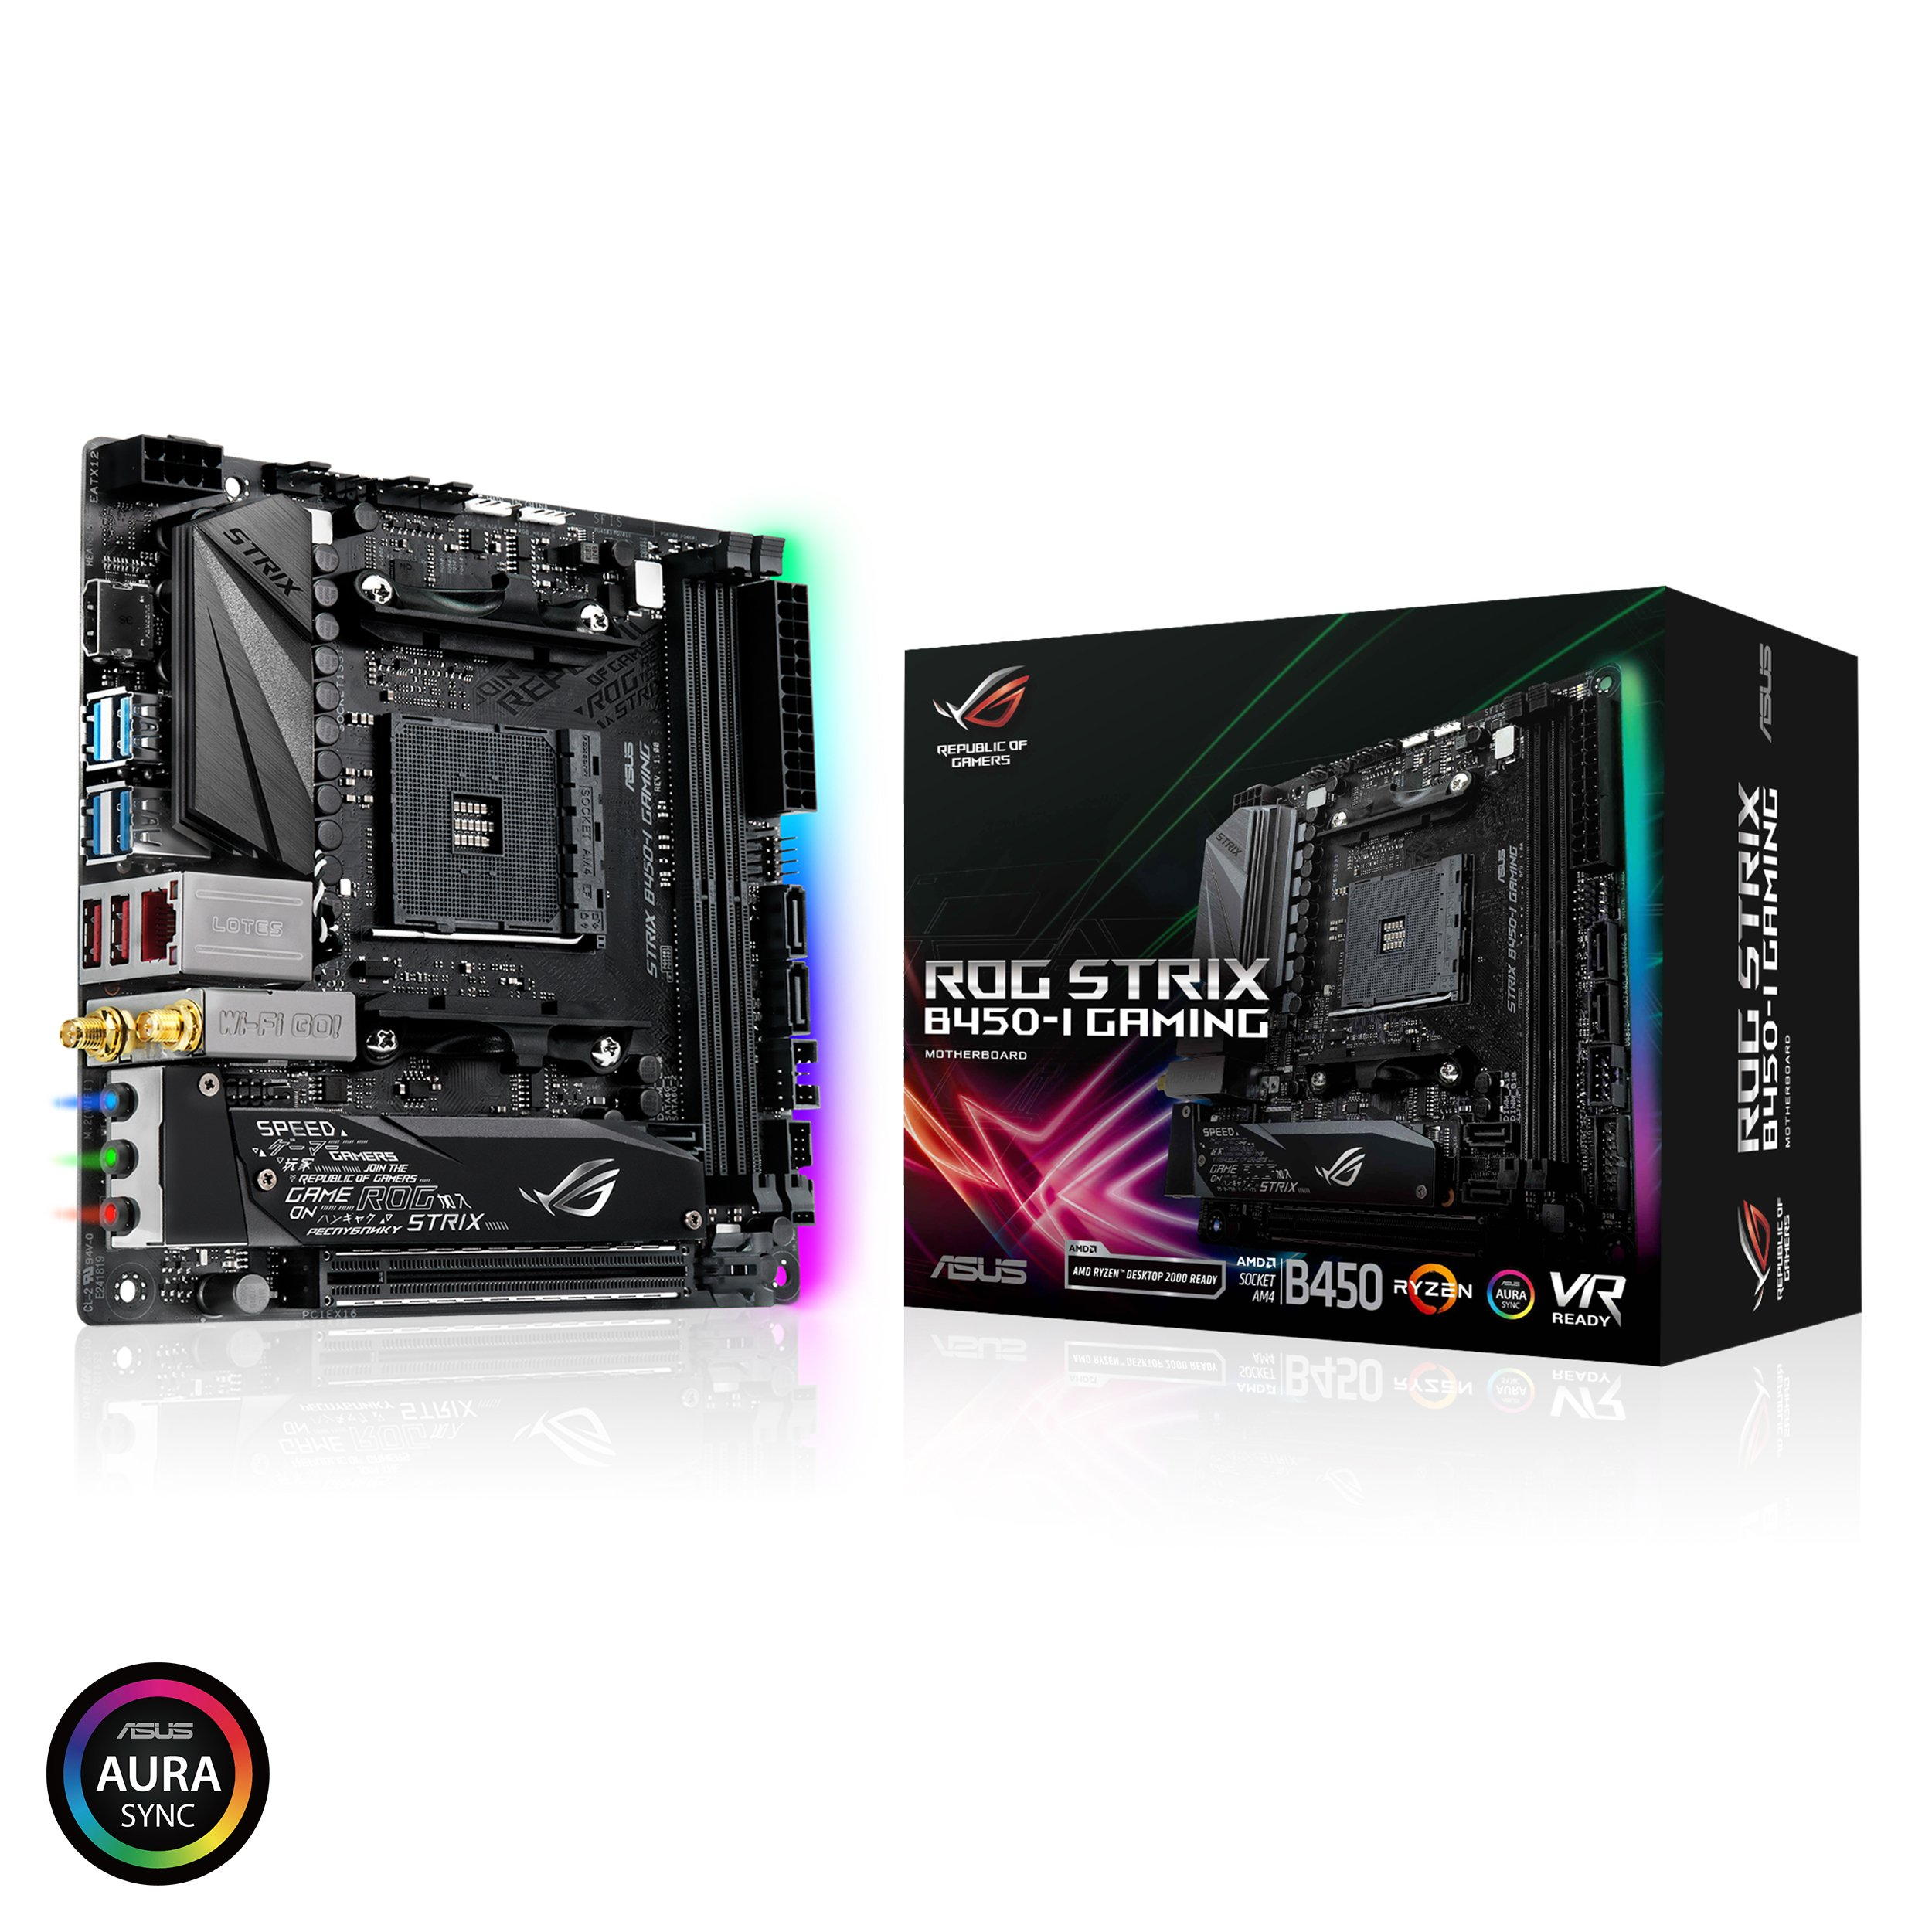 ASUS ROG Strix B450-I Gaming Motherboard (Mini ITX) AMD Ryzen 2 AM4 DDR4 HDMI M.2 USB 3.1 Gen2 B450